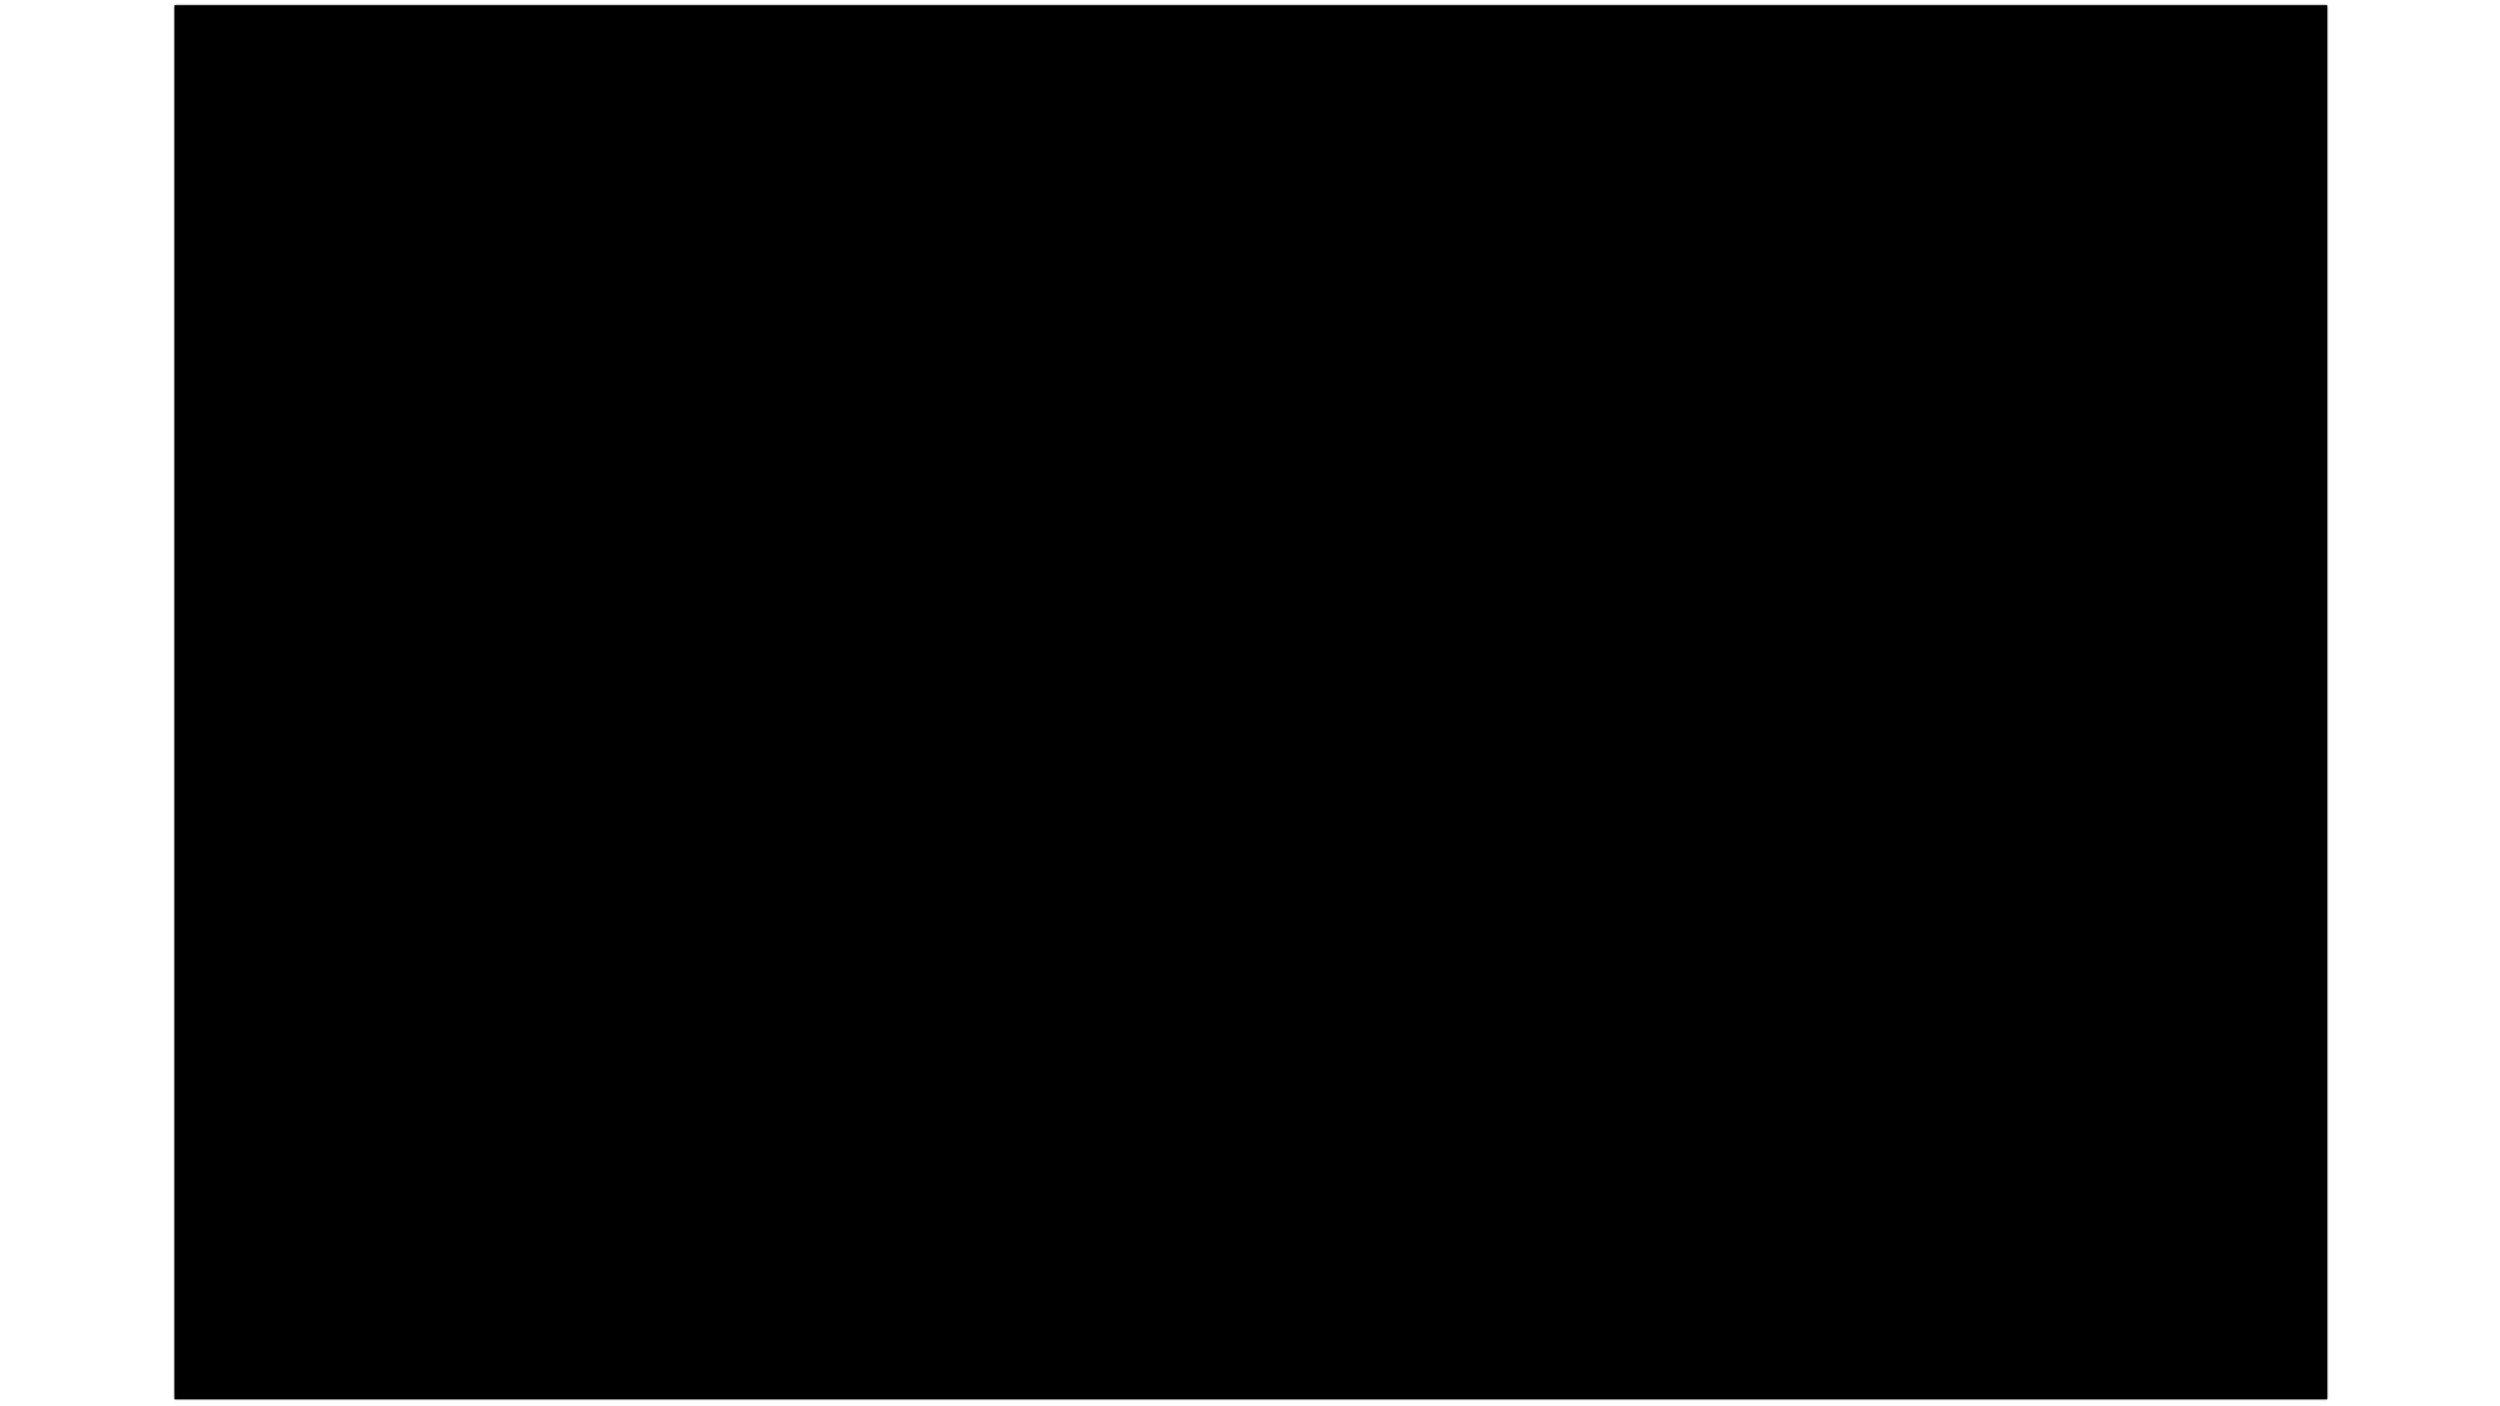 GD169.jpg